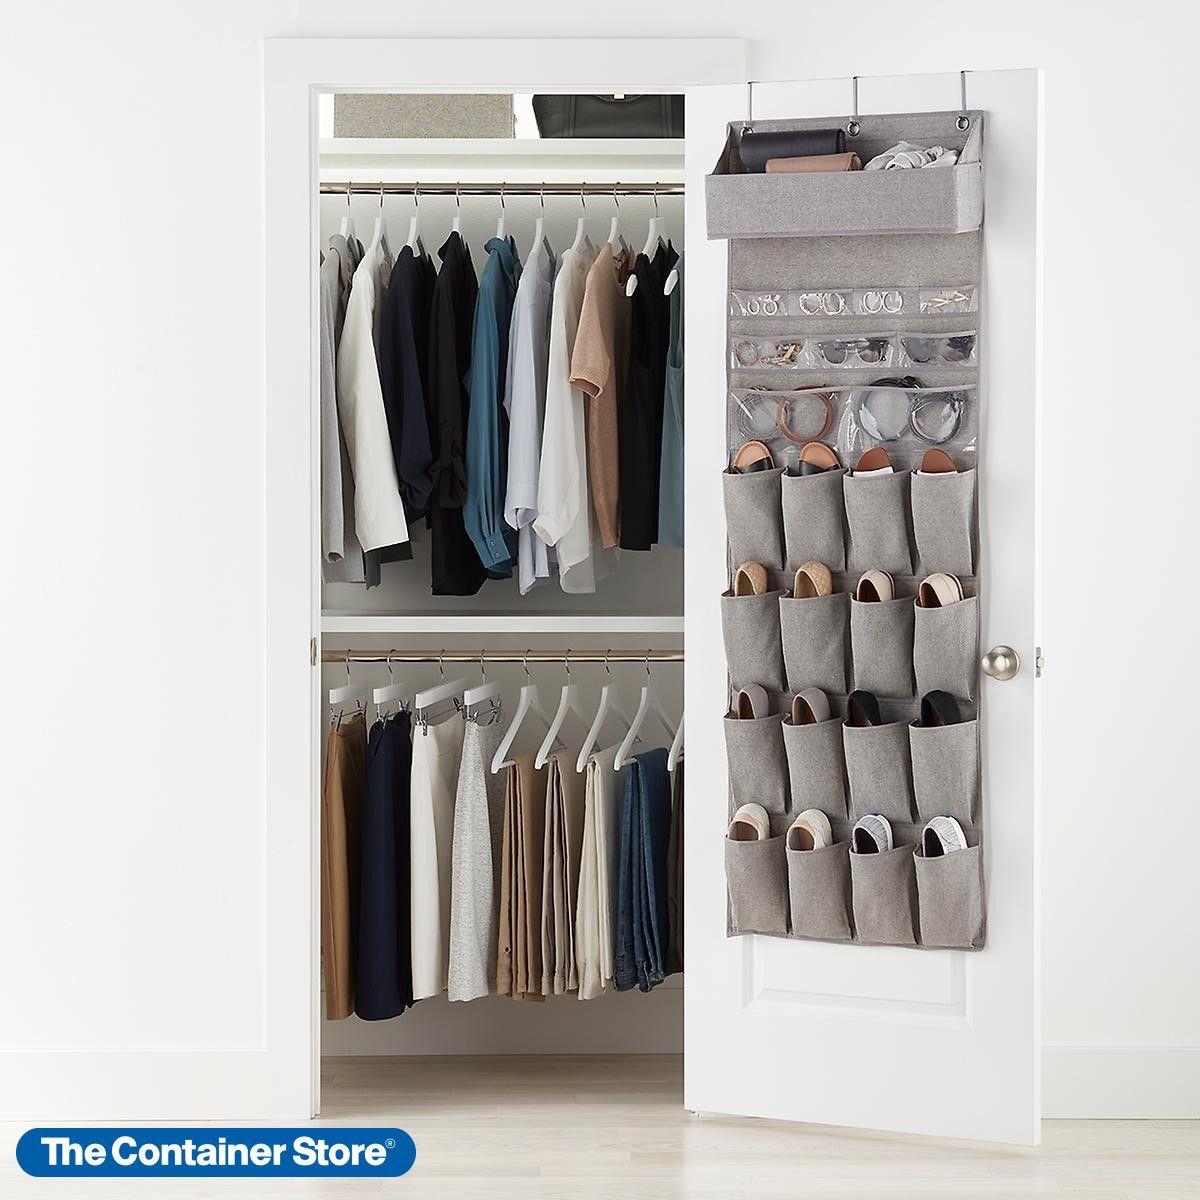 24 Pockets Over Door Hanging Bag Box Shoe Rack Hanger Storage Tidy Closet Holder